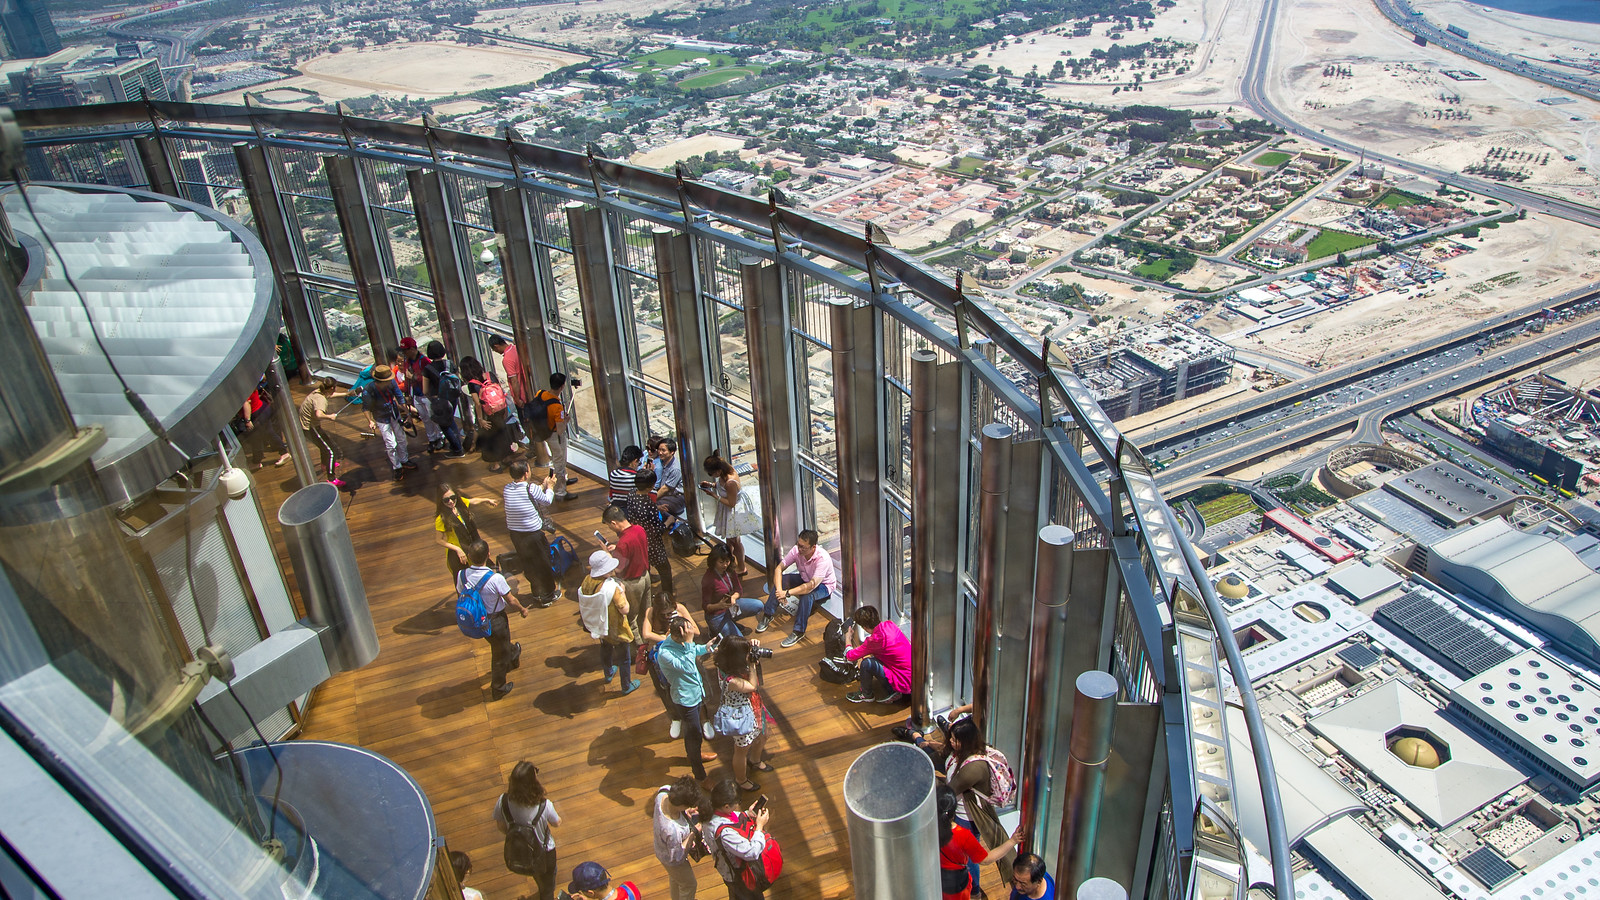 Burj Khalifa 124th floor